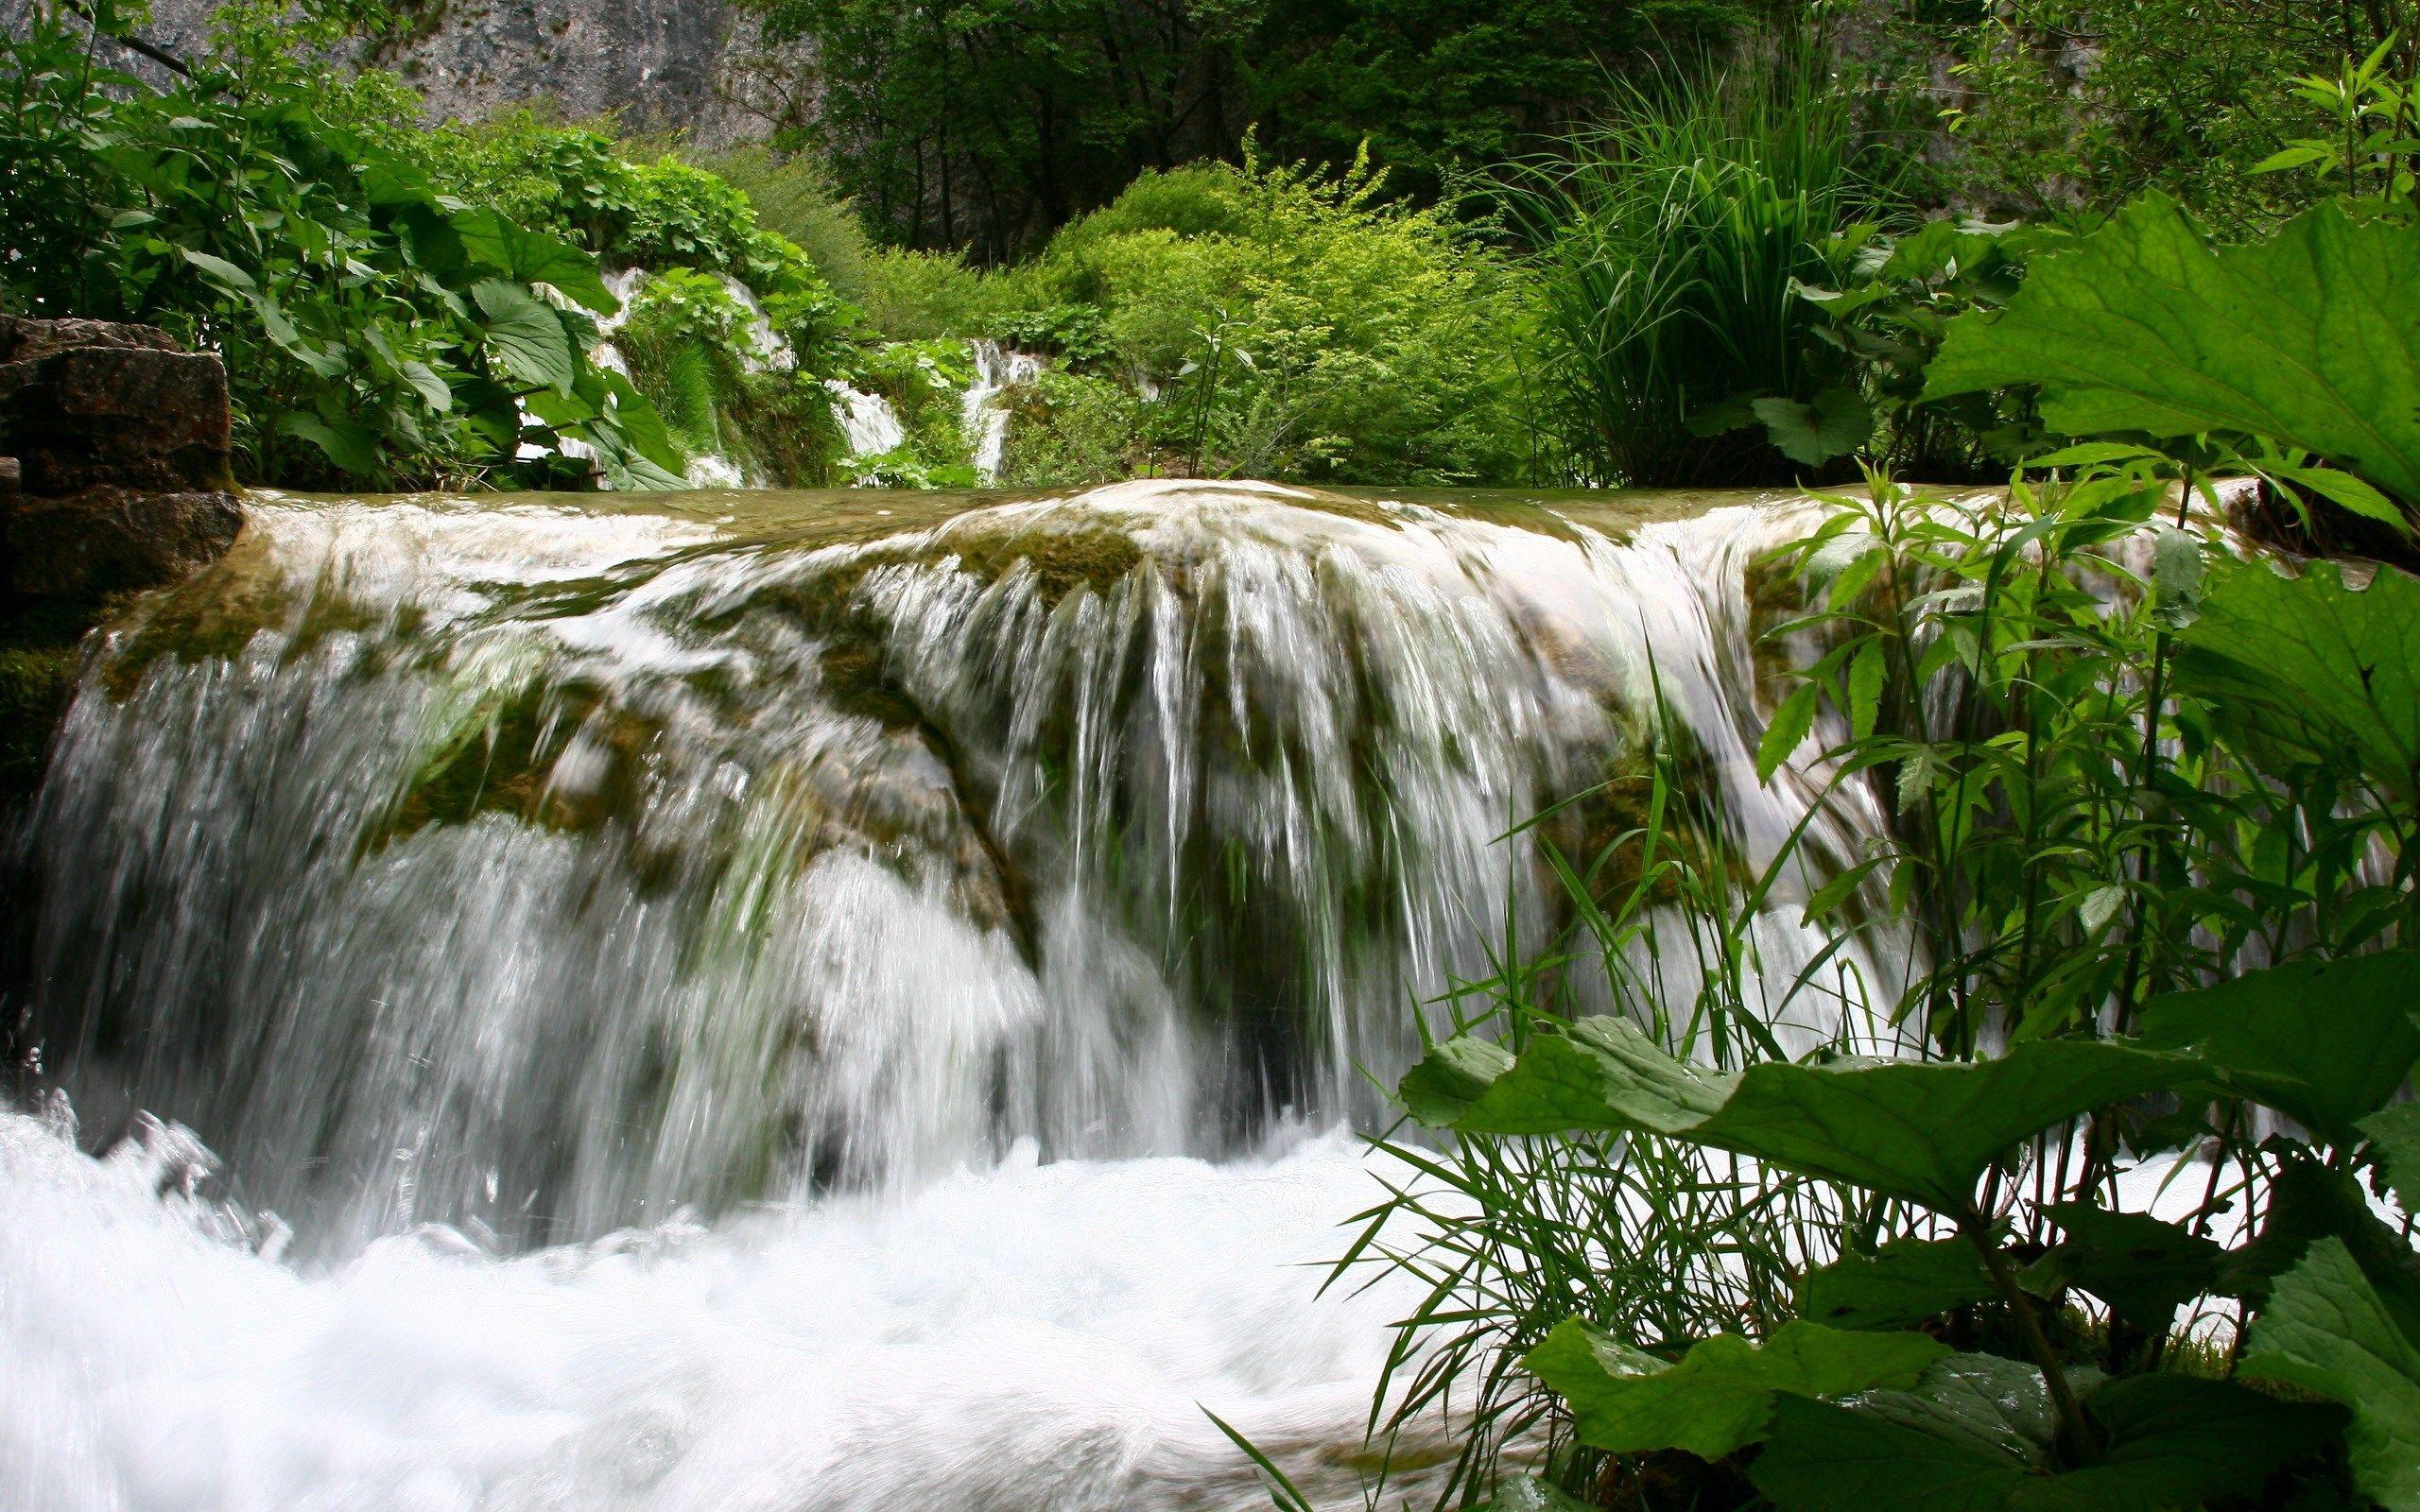 free desktop backgrounds for waterfall henley blare 2560x1600